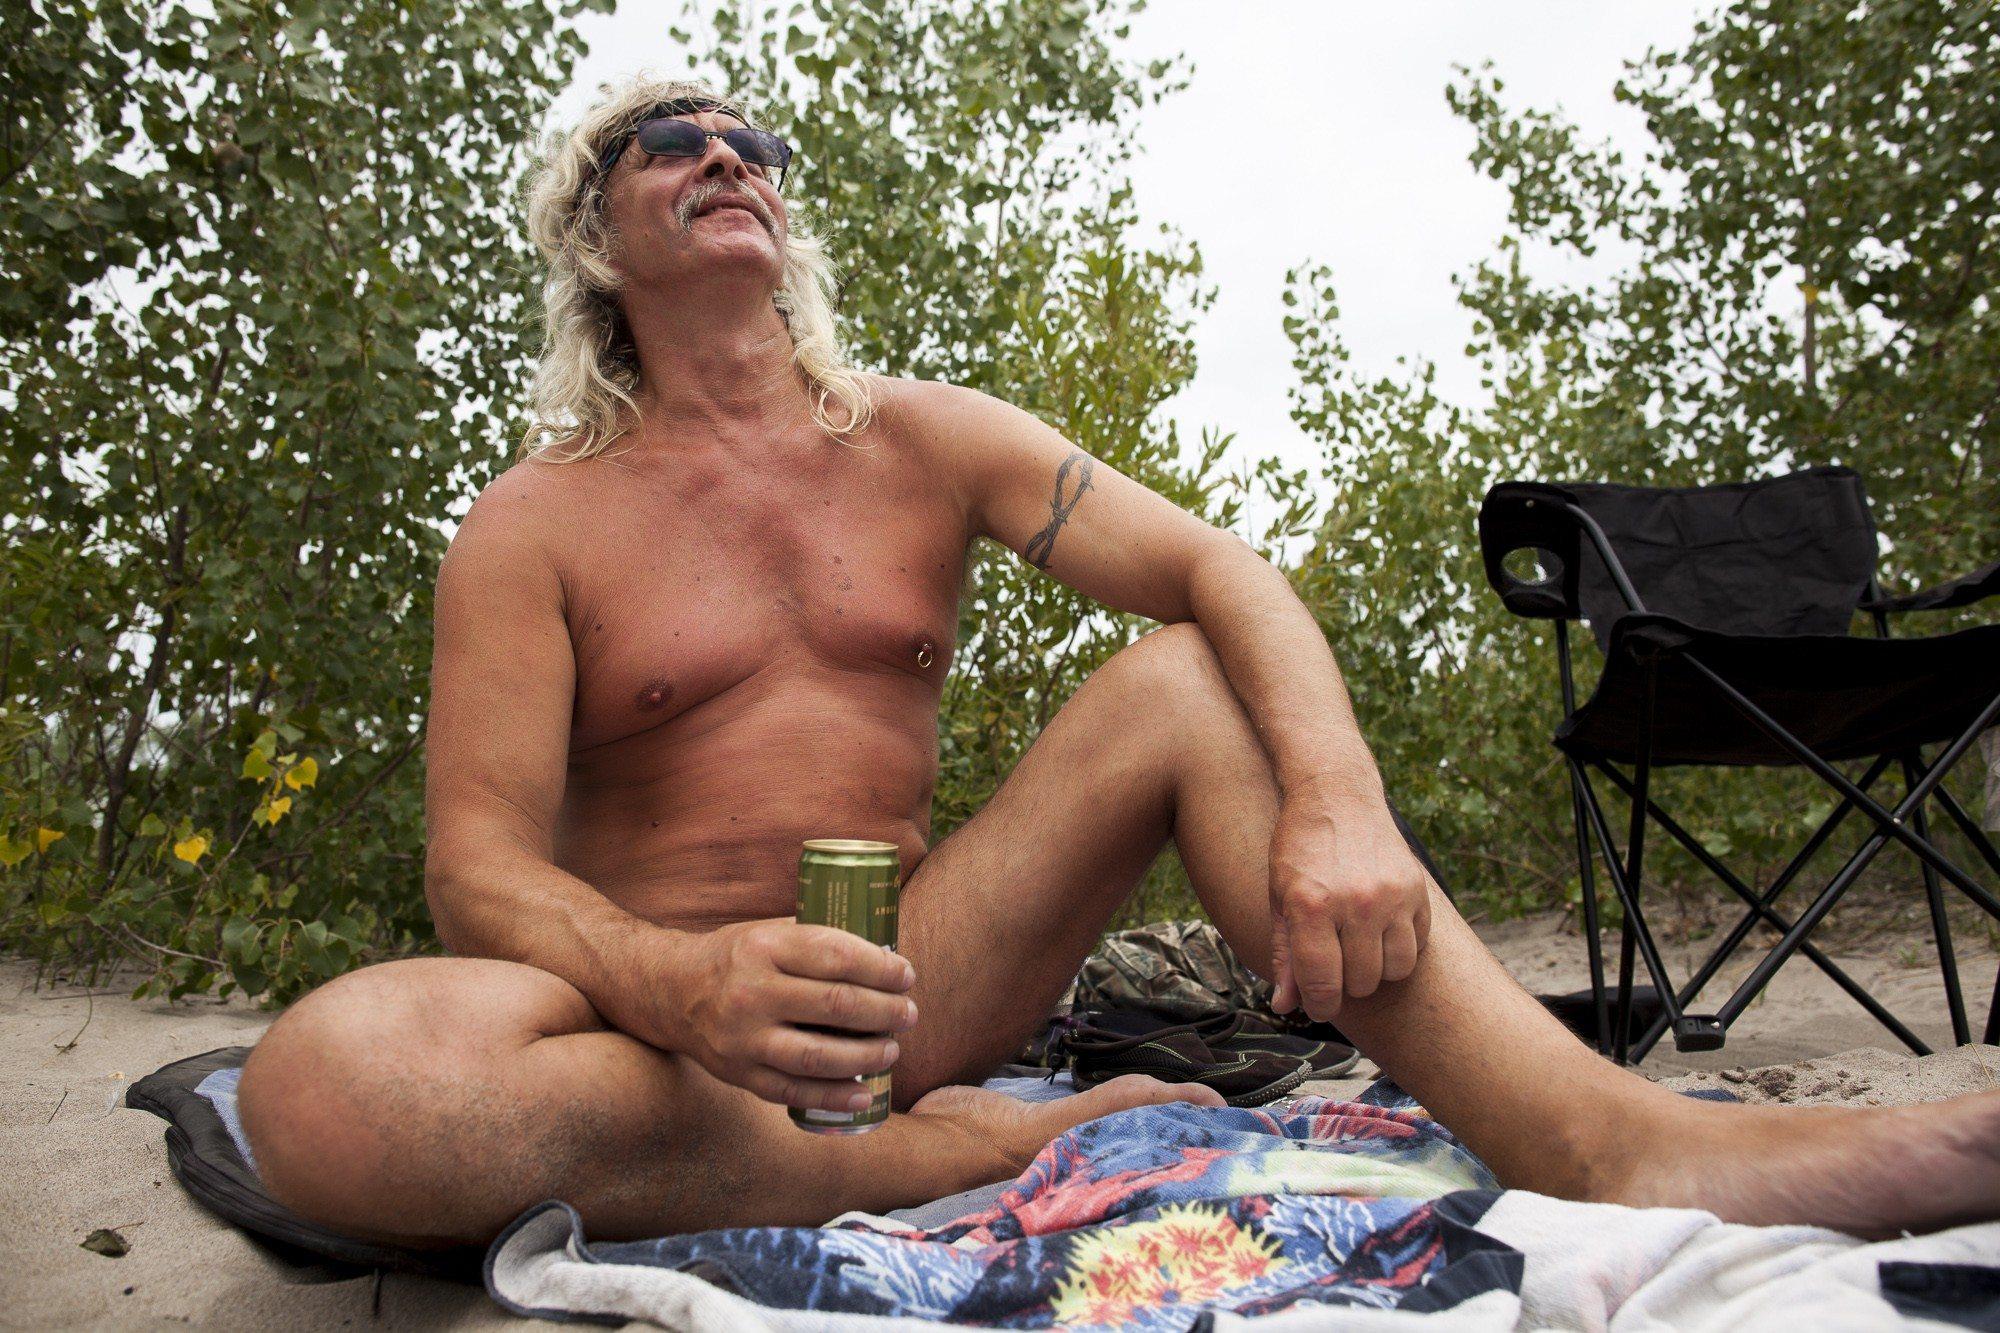 toronto-streeters-hanlans-point-nude-beach-clothing-optional-gene-dare